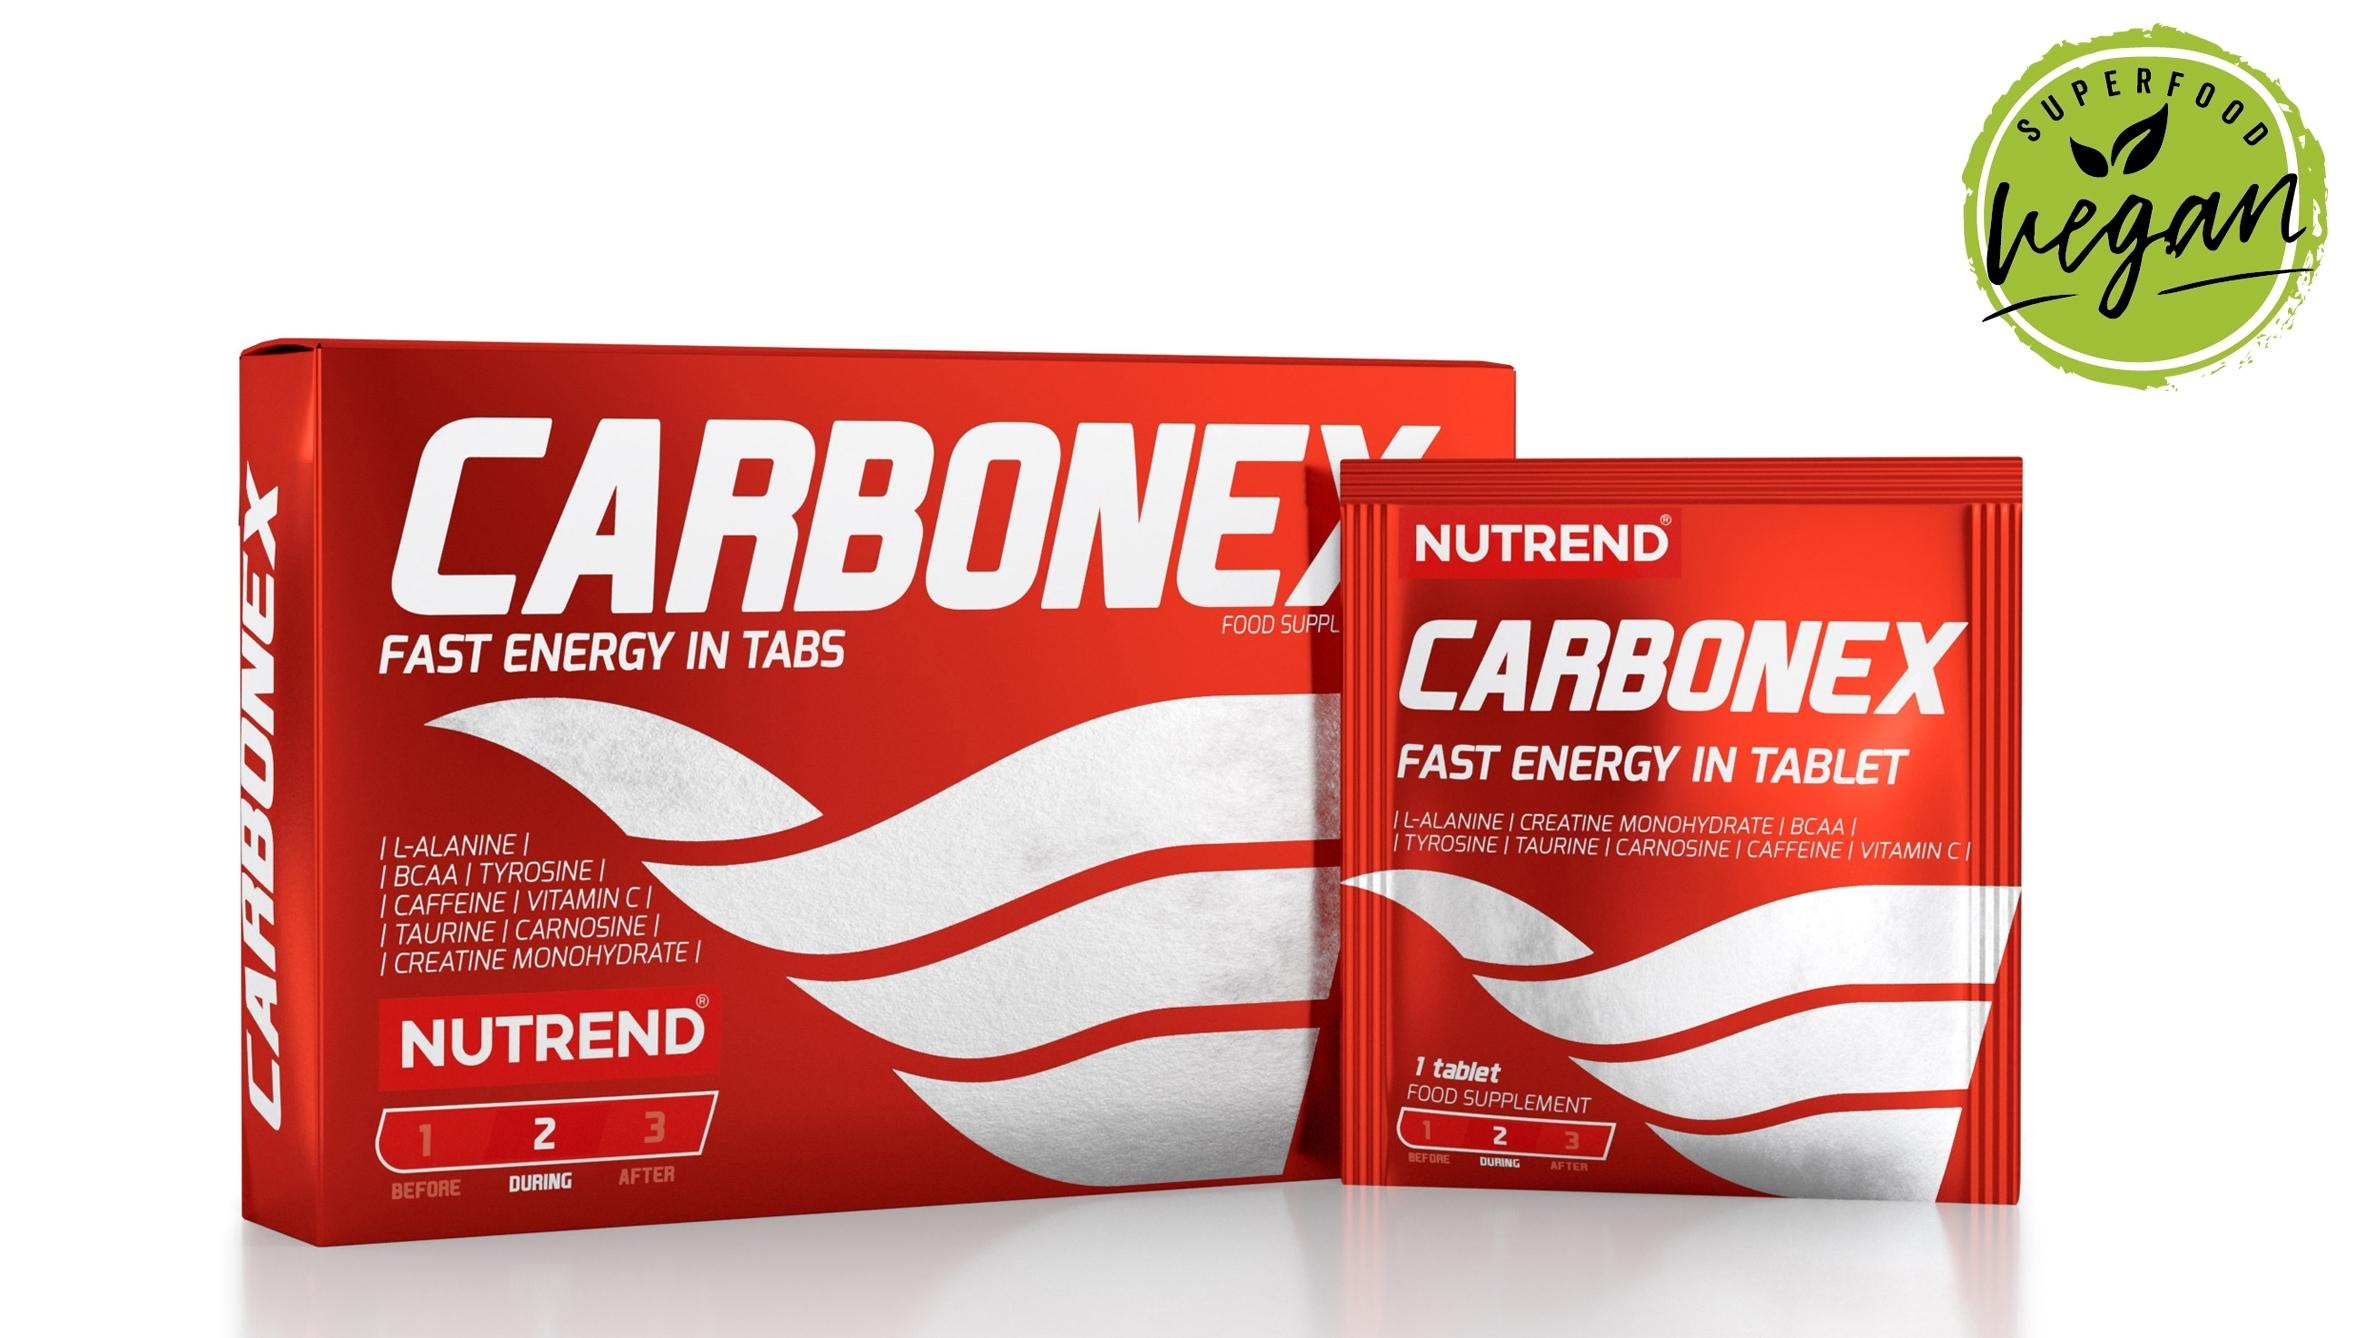 CARBONEX energy sport tablets, obsahuje 12 tablet